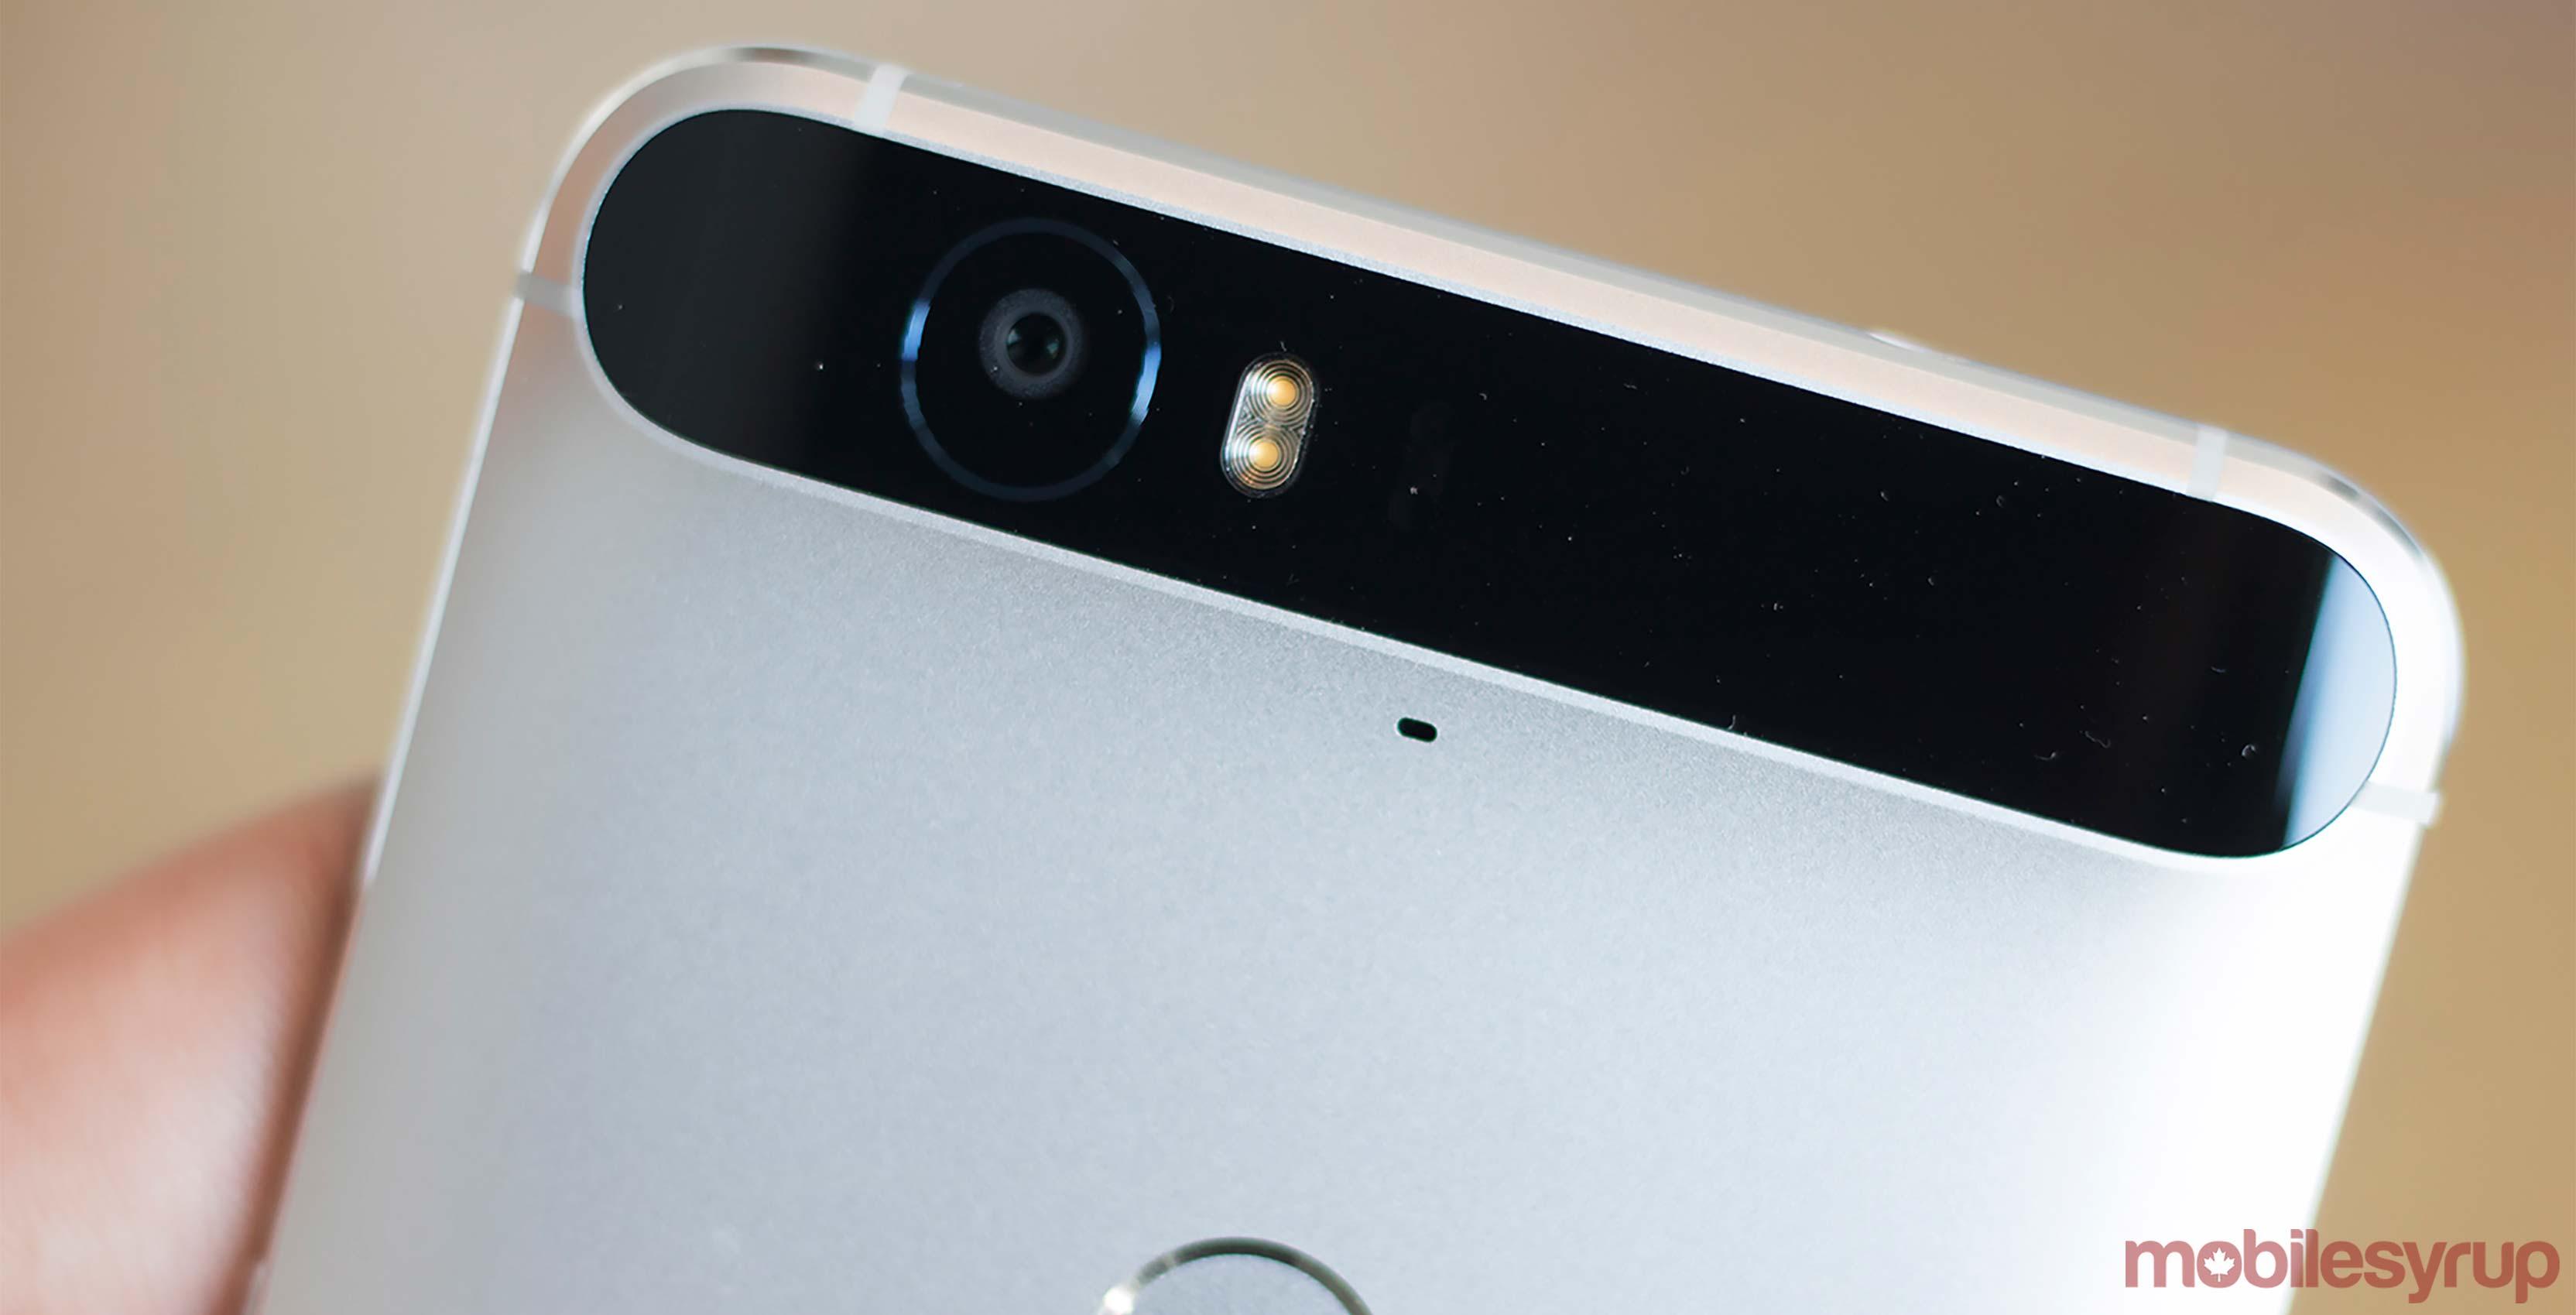 Back of Google Nexus 6P smartphone